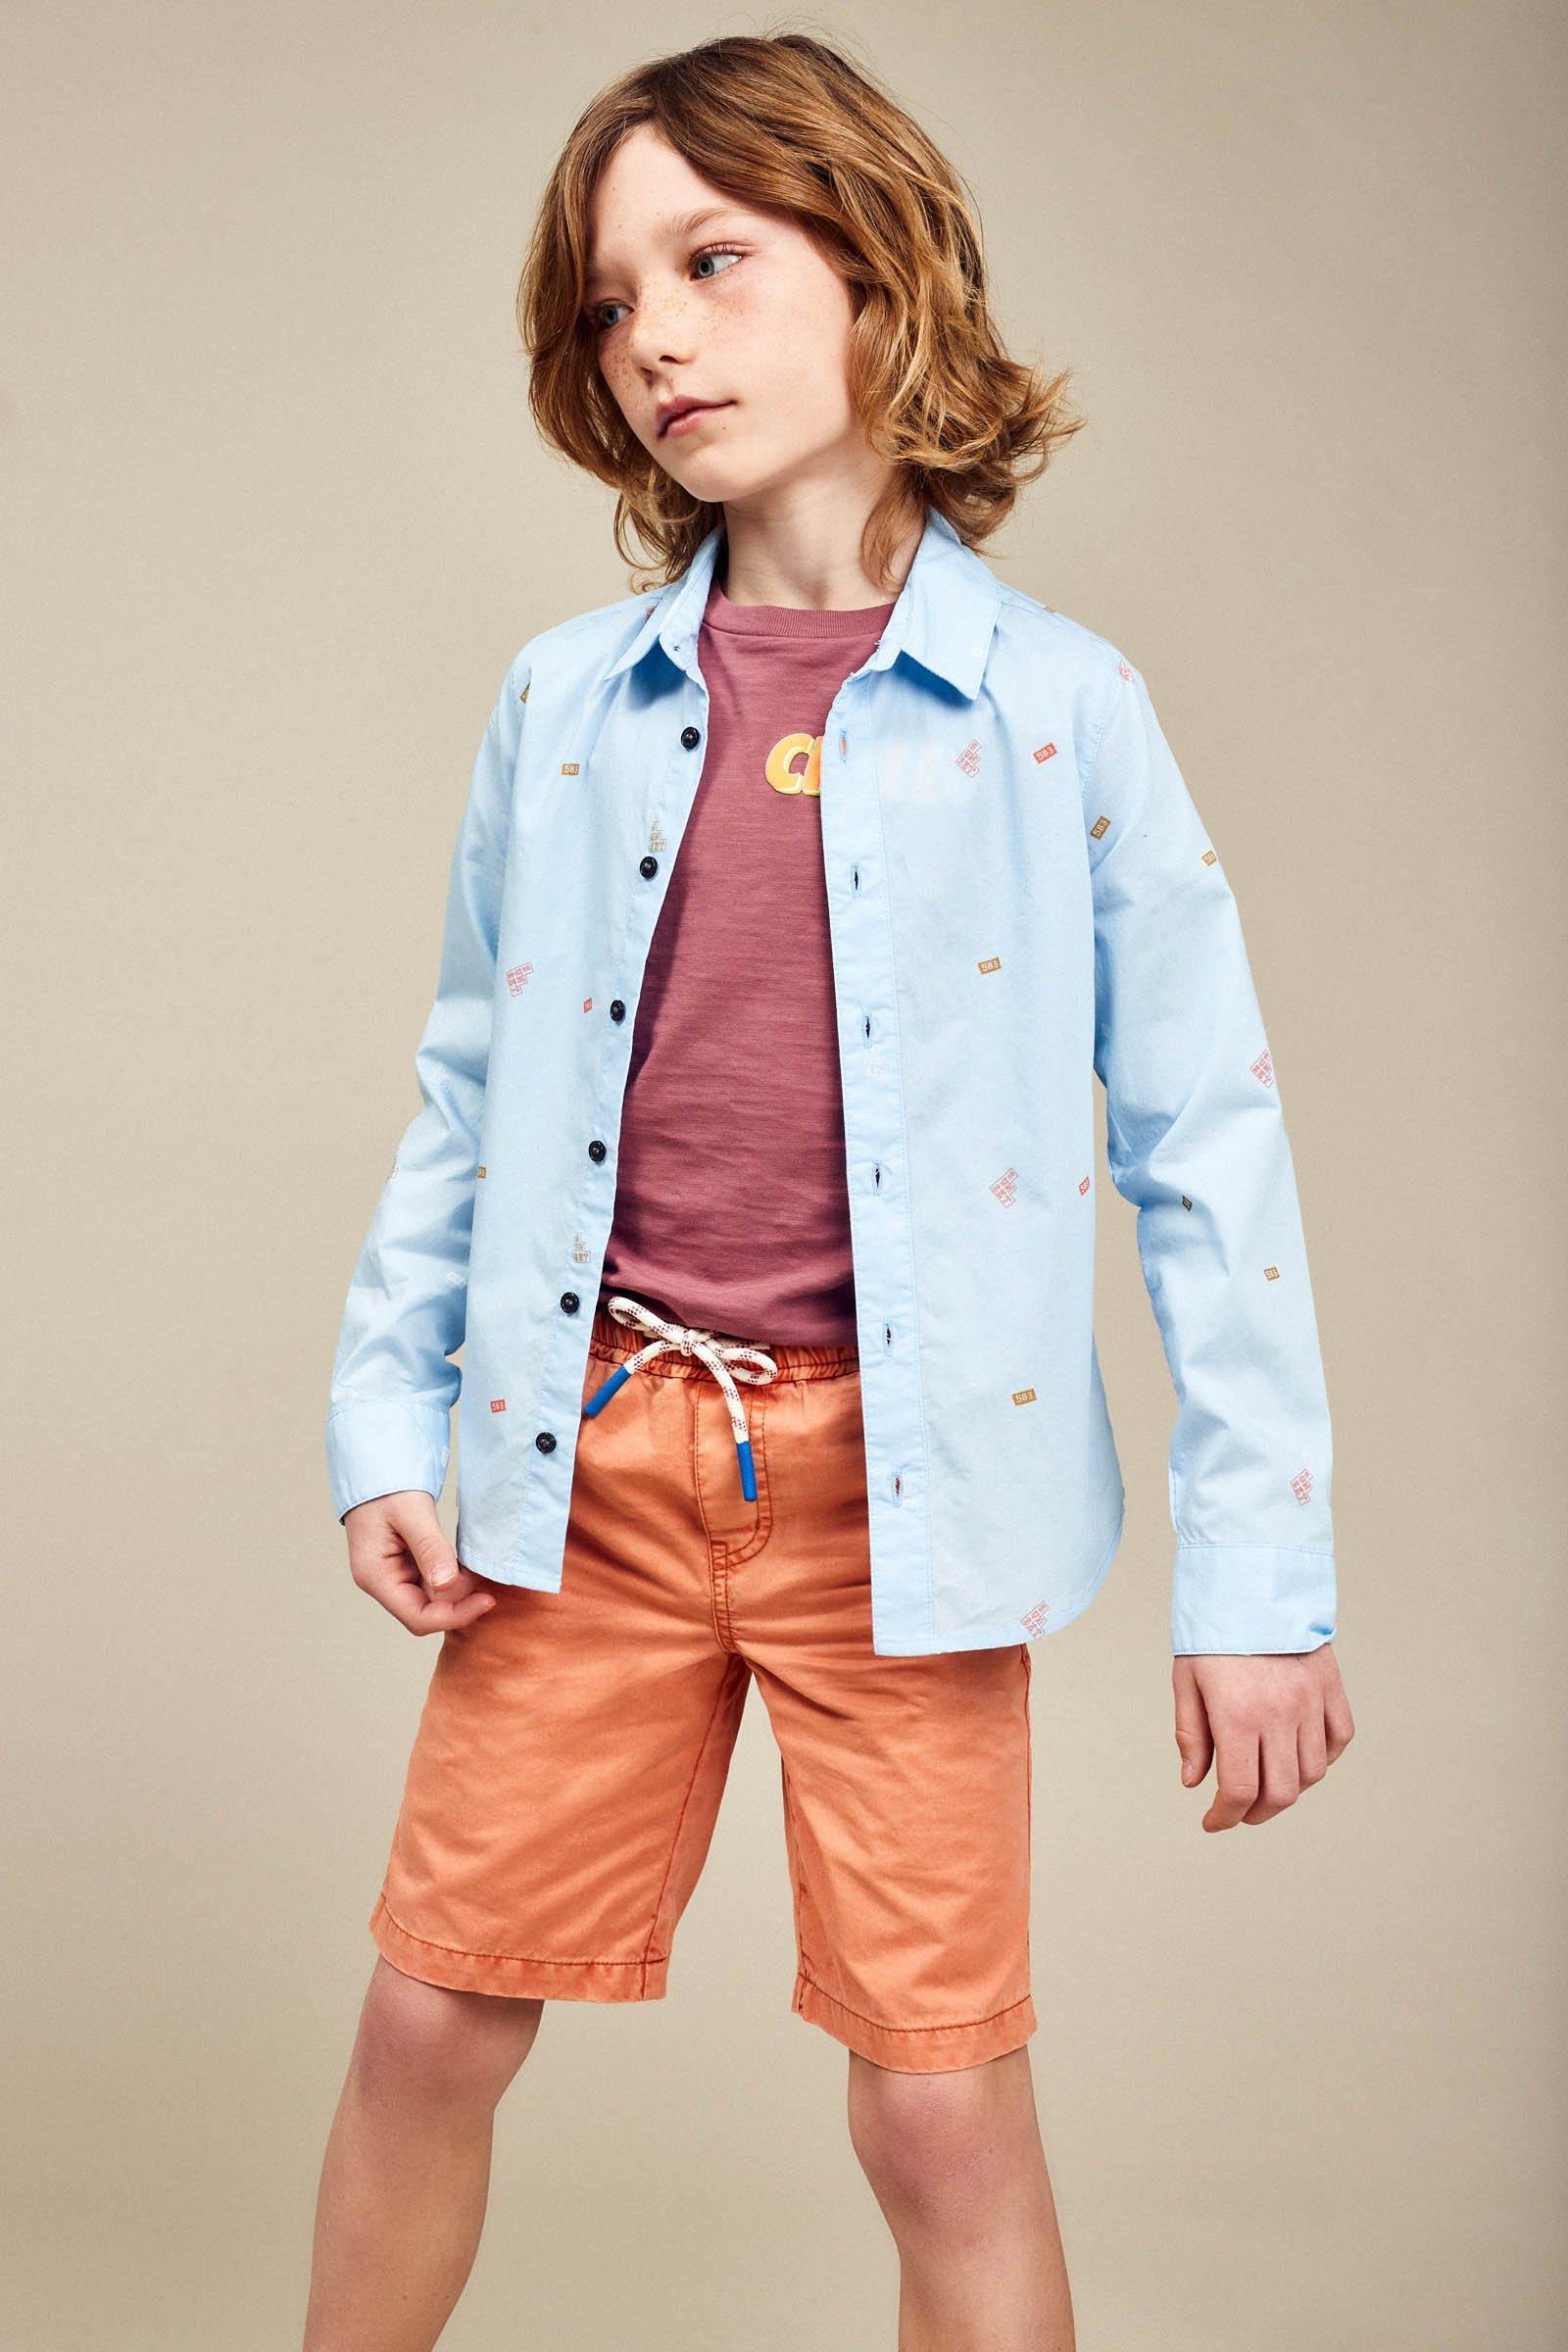 CKS Kids - YACOBS - t-shirt korte mouwen - rood